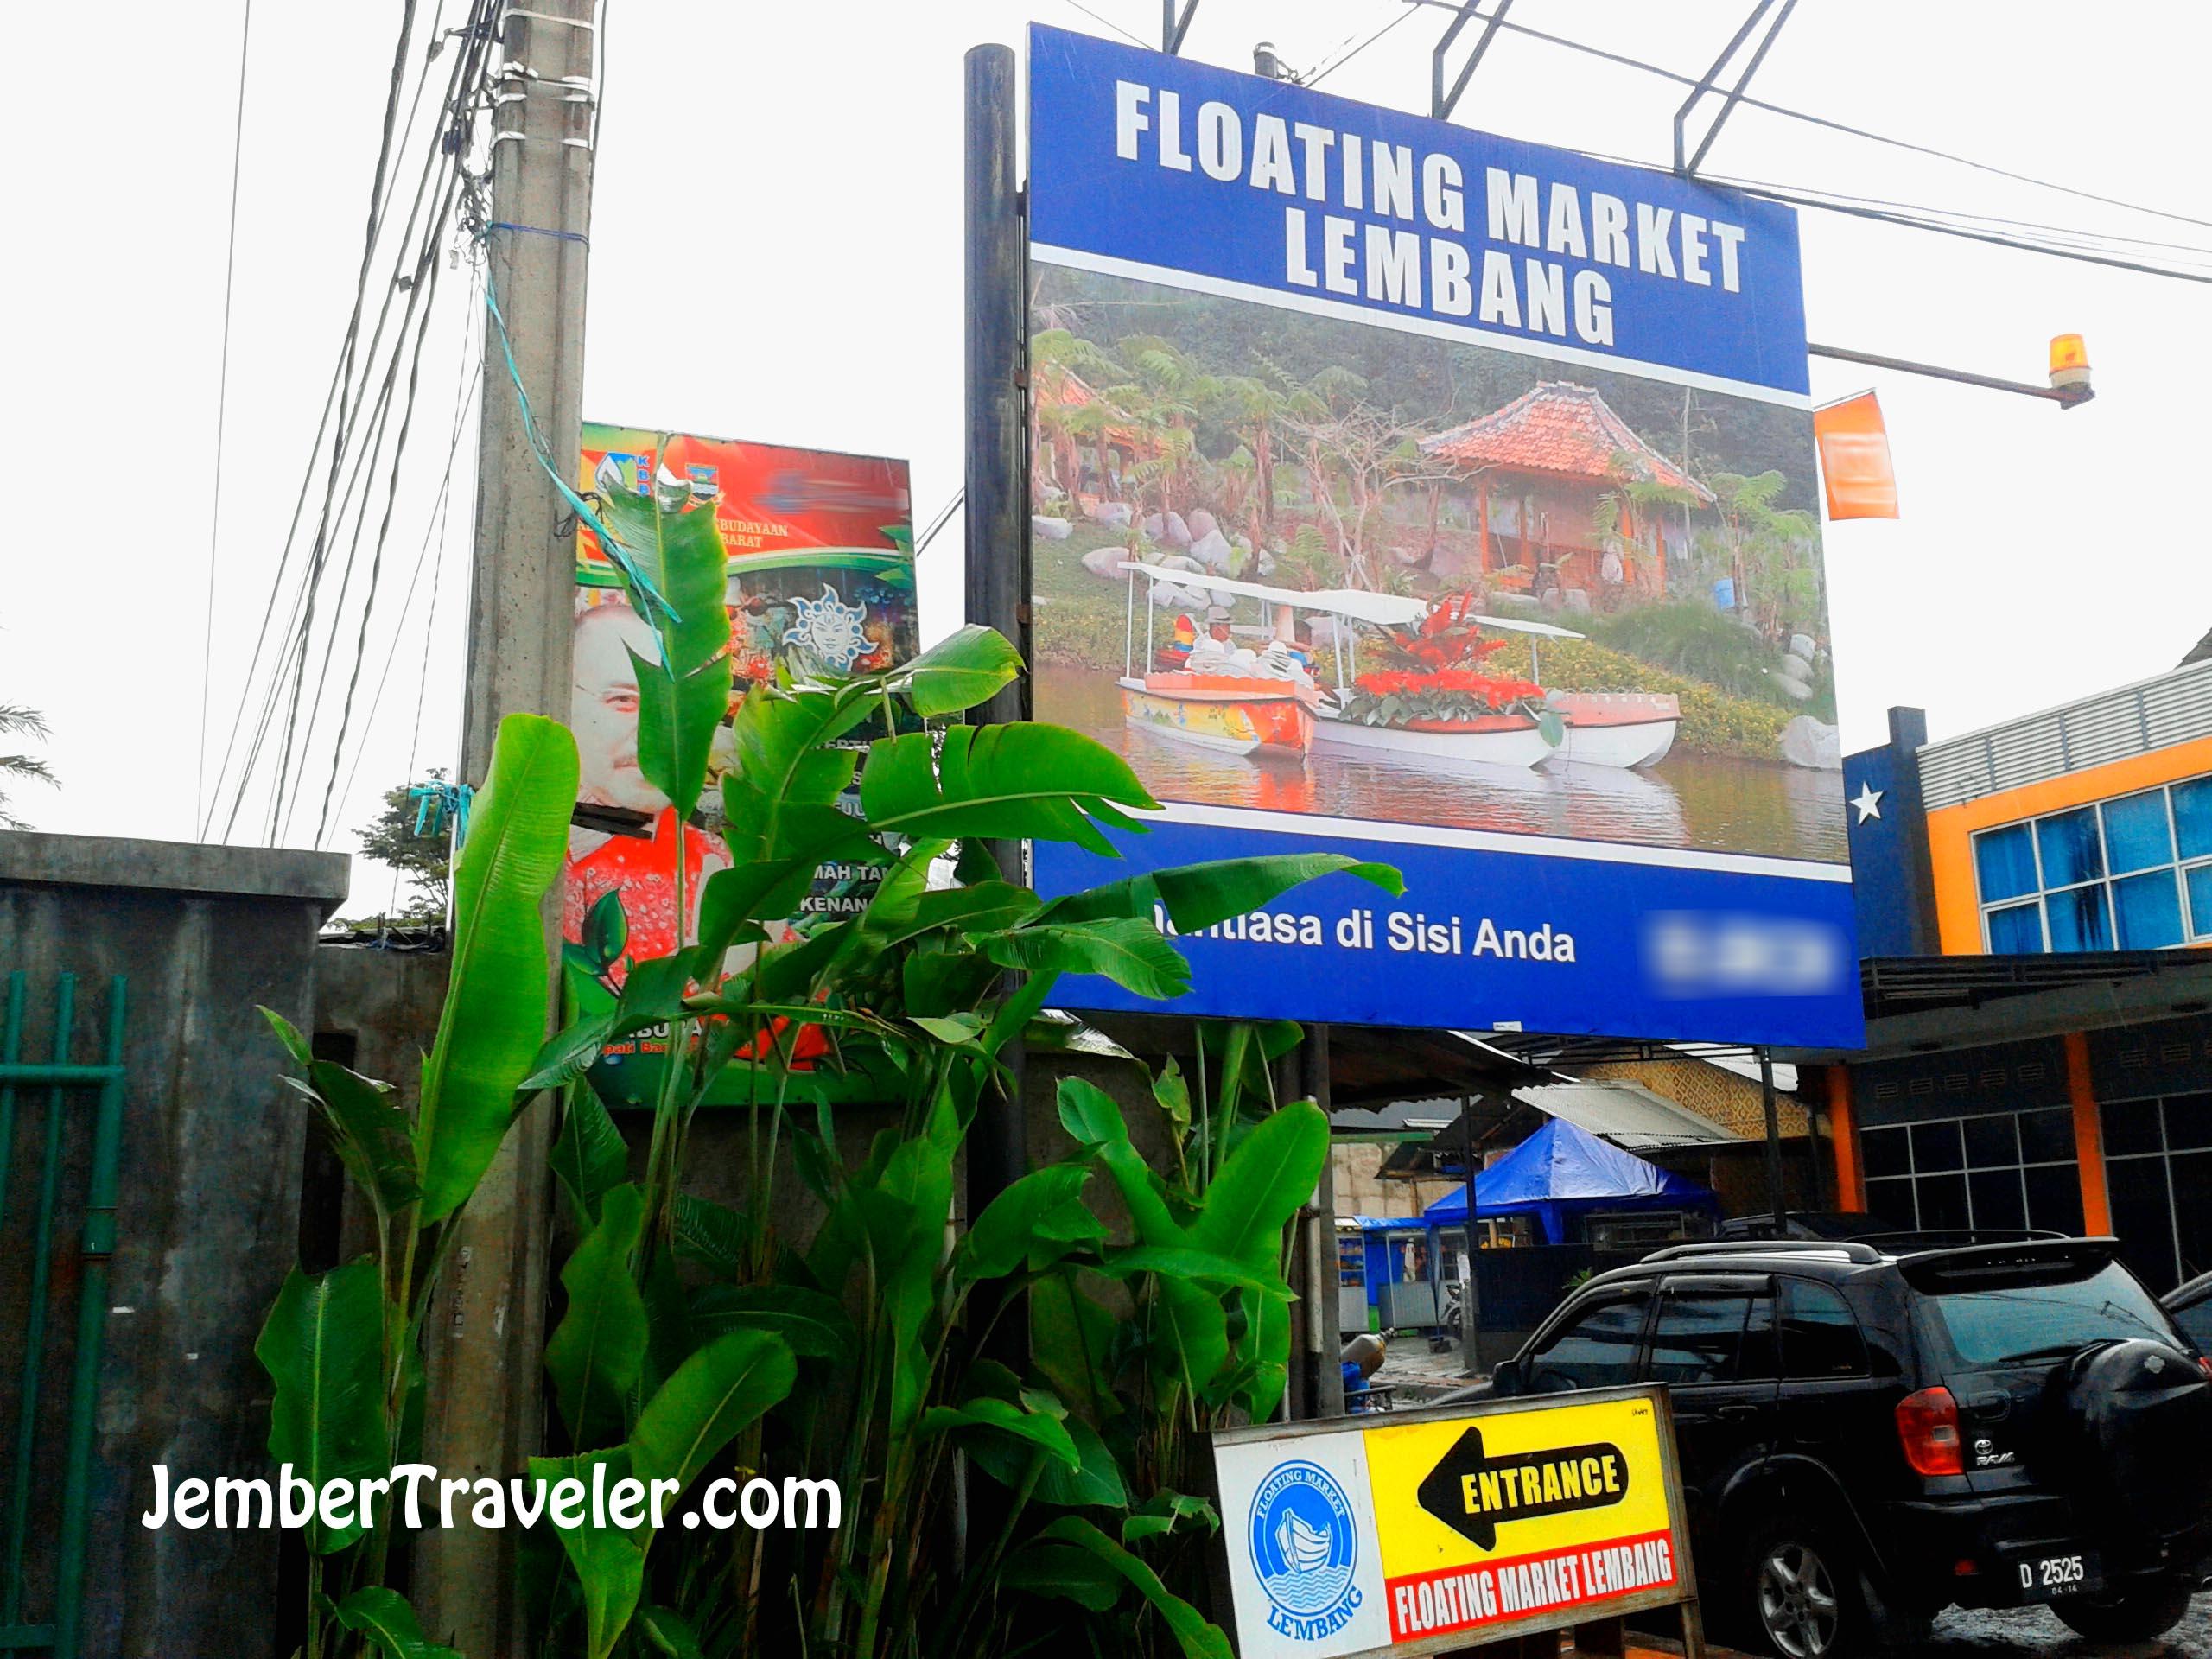 Floating Market Lembang Logo Tiket Masuk Michelle Francleemichelle Franclee Berteduh Di Pasar Terapung Bandung Jember Traveler